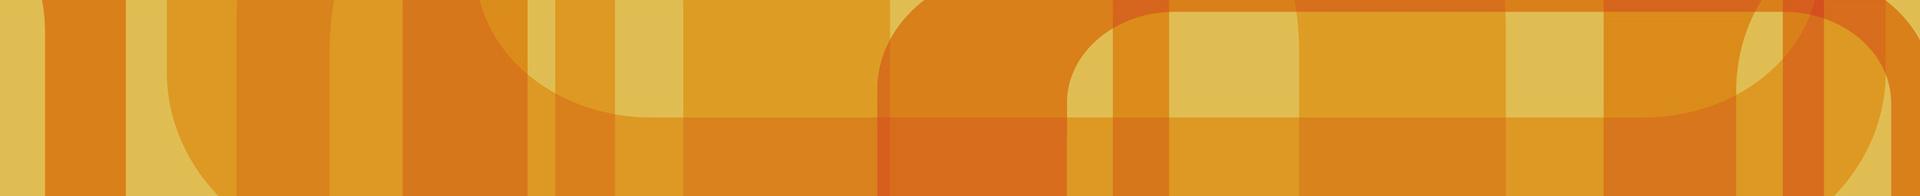 Orange funky retro background